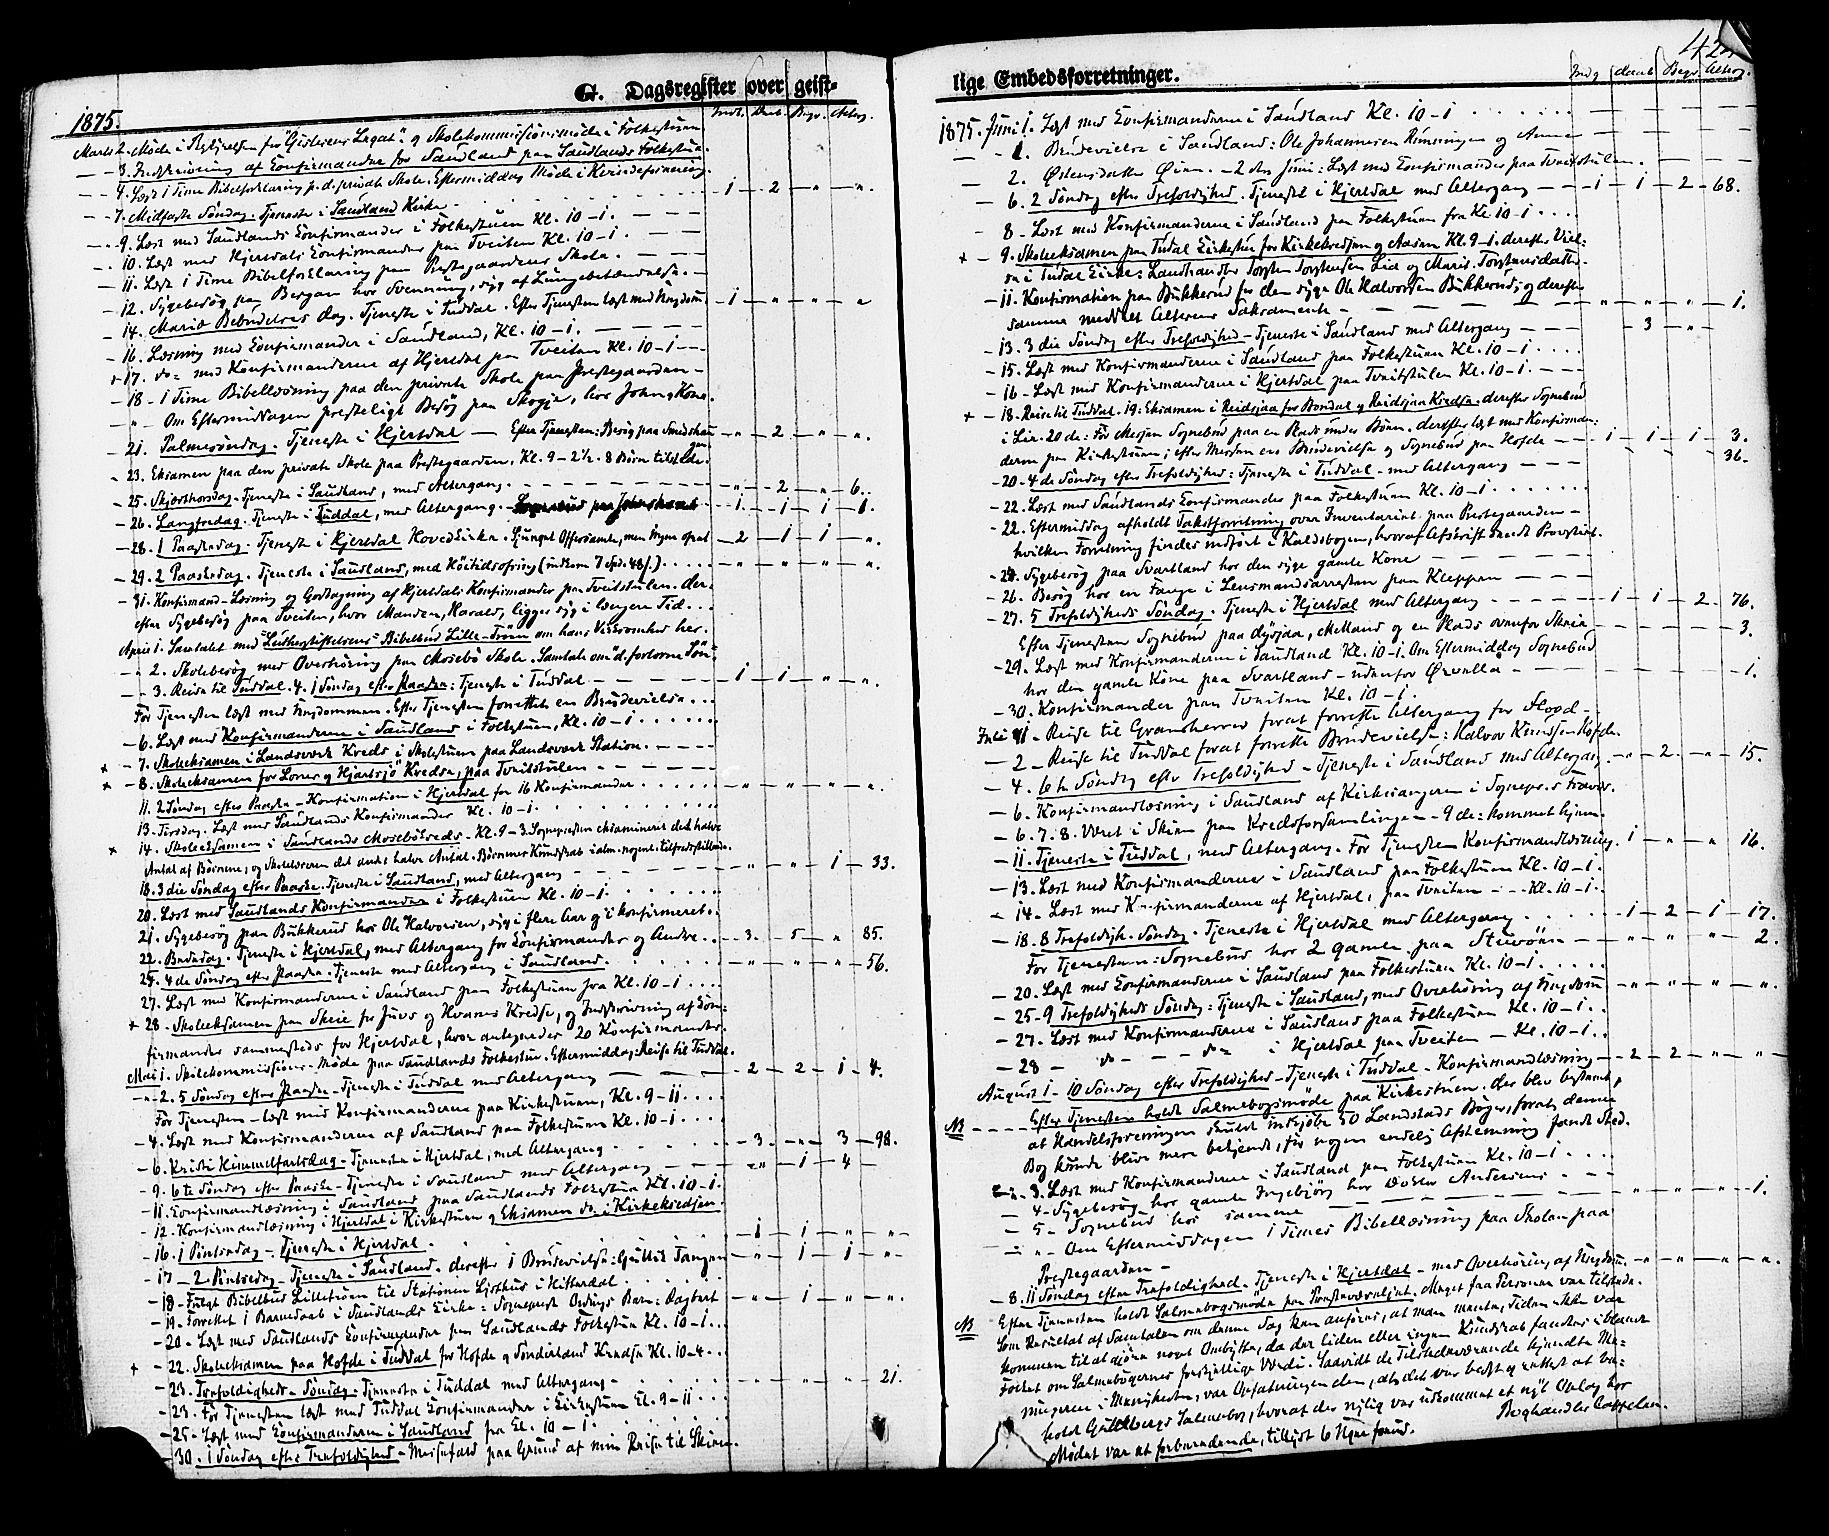 SAKO, Hjartdal kirkebøker, F/Fa/L0009: Ministerialbok nr. I 9, 1860-1879, s. 424